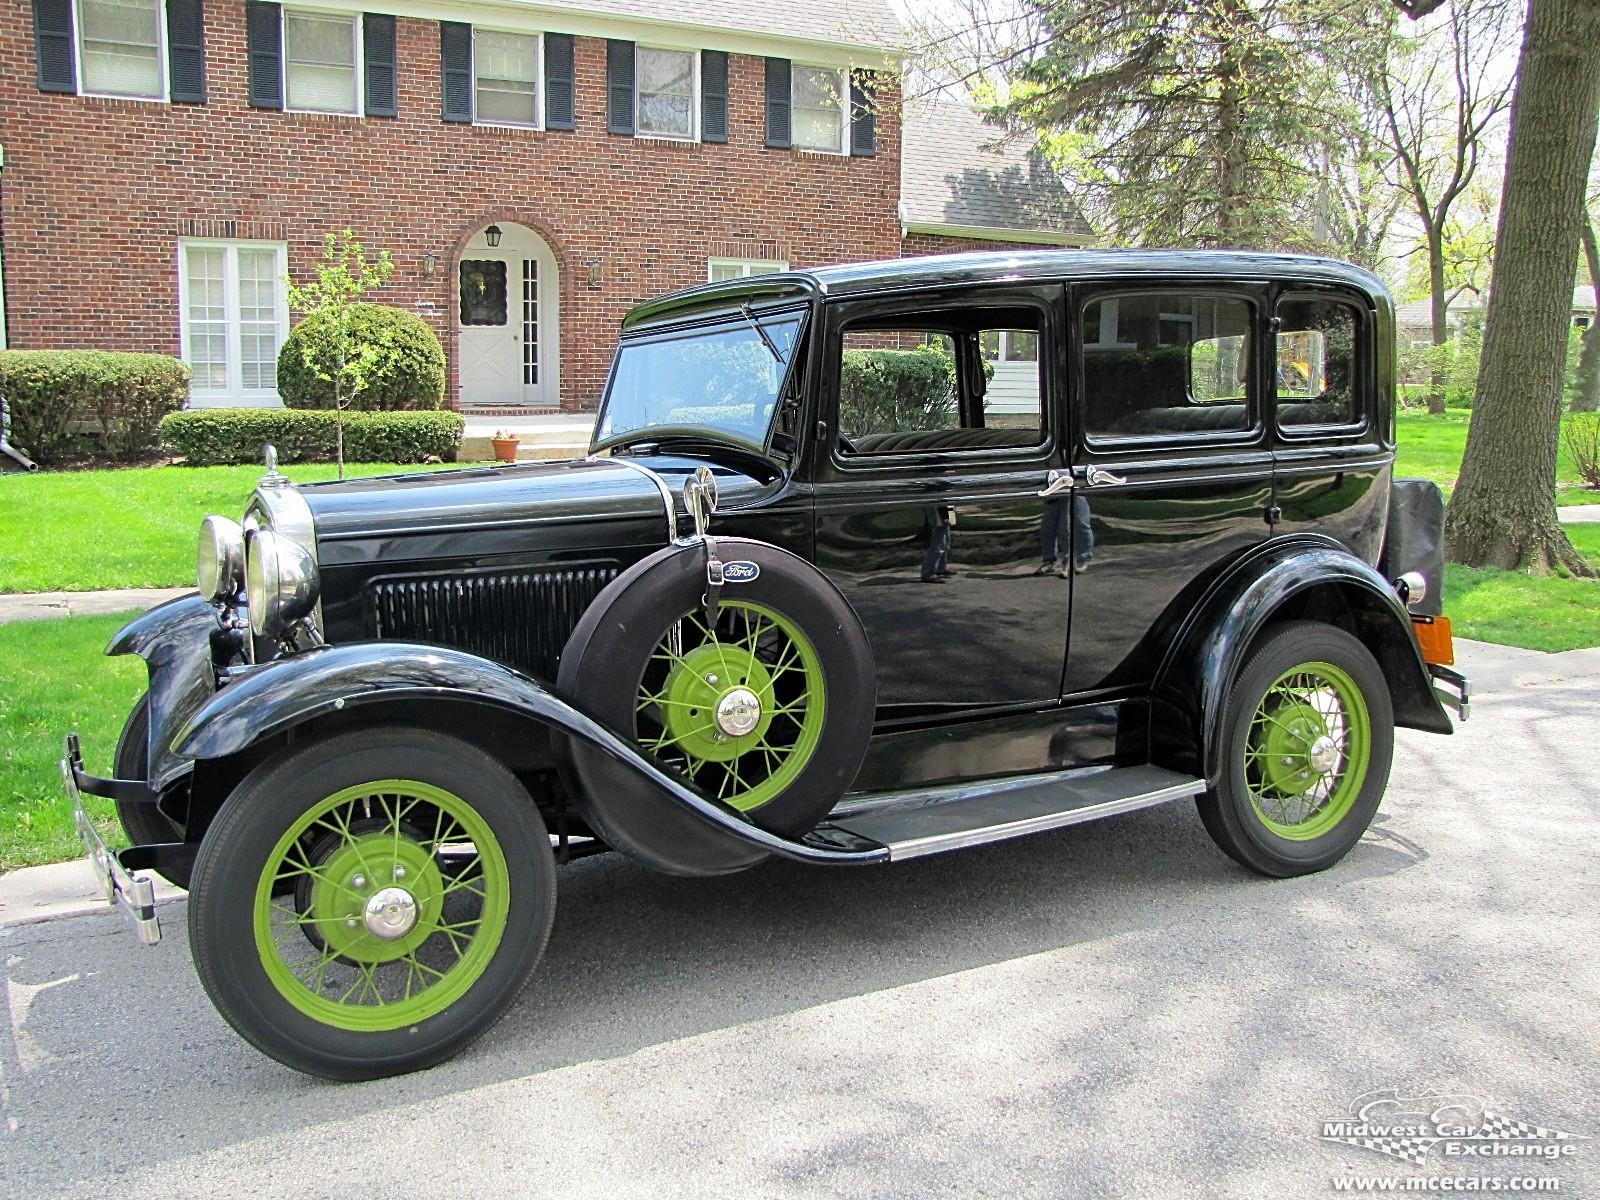 19315 model20a20002